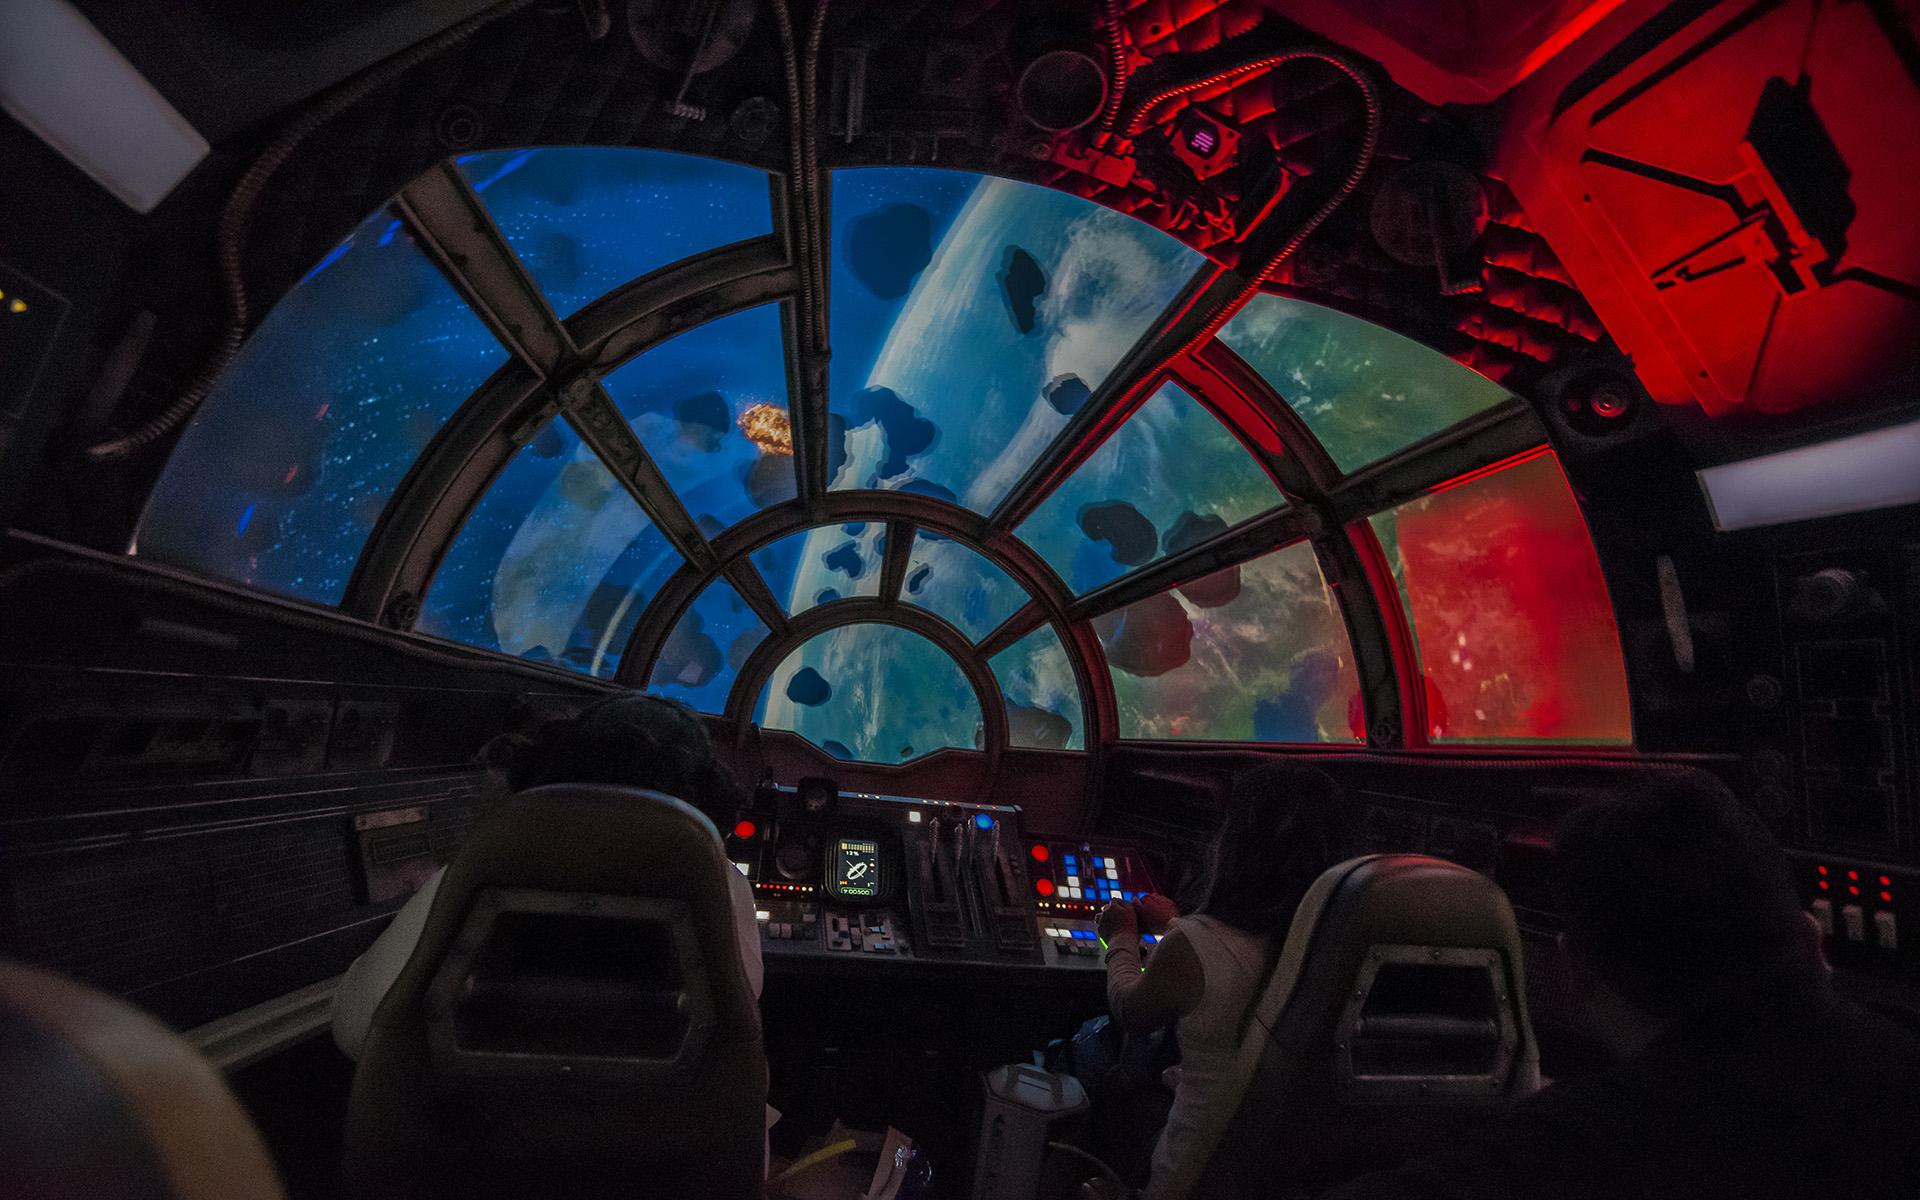 Millennium Falcon Cockpit Wallpaper Posted By John Johnson